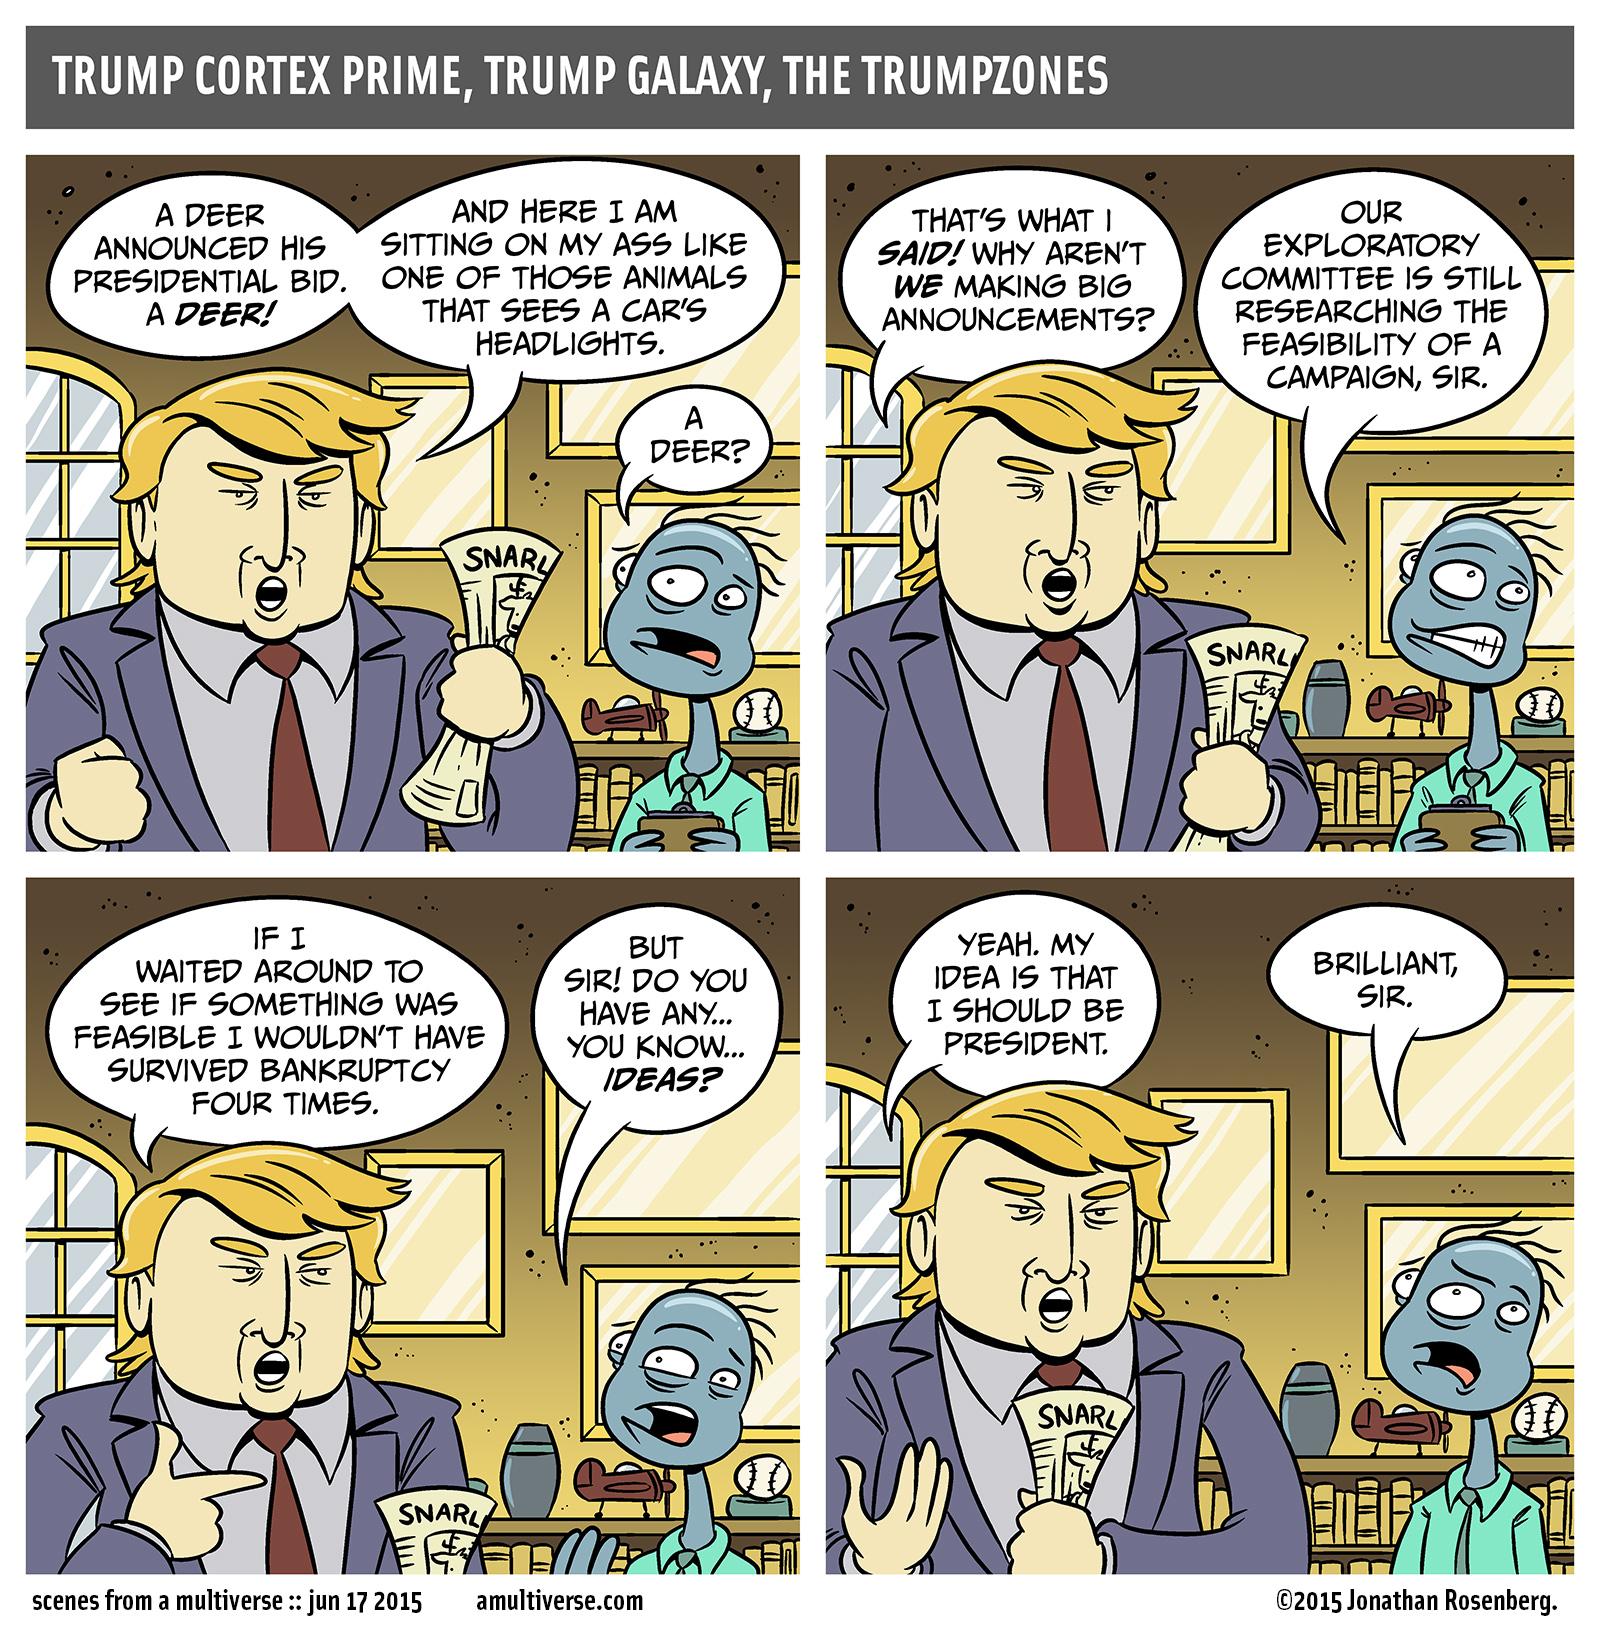 Trump/Trump's Toupee 2016